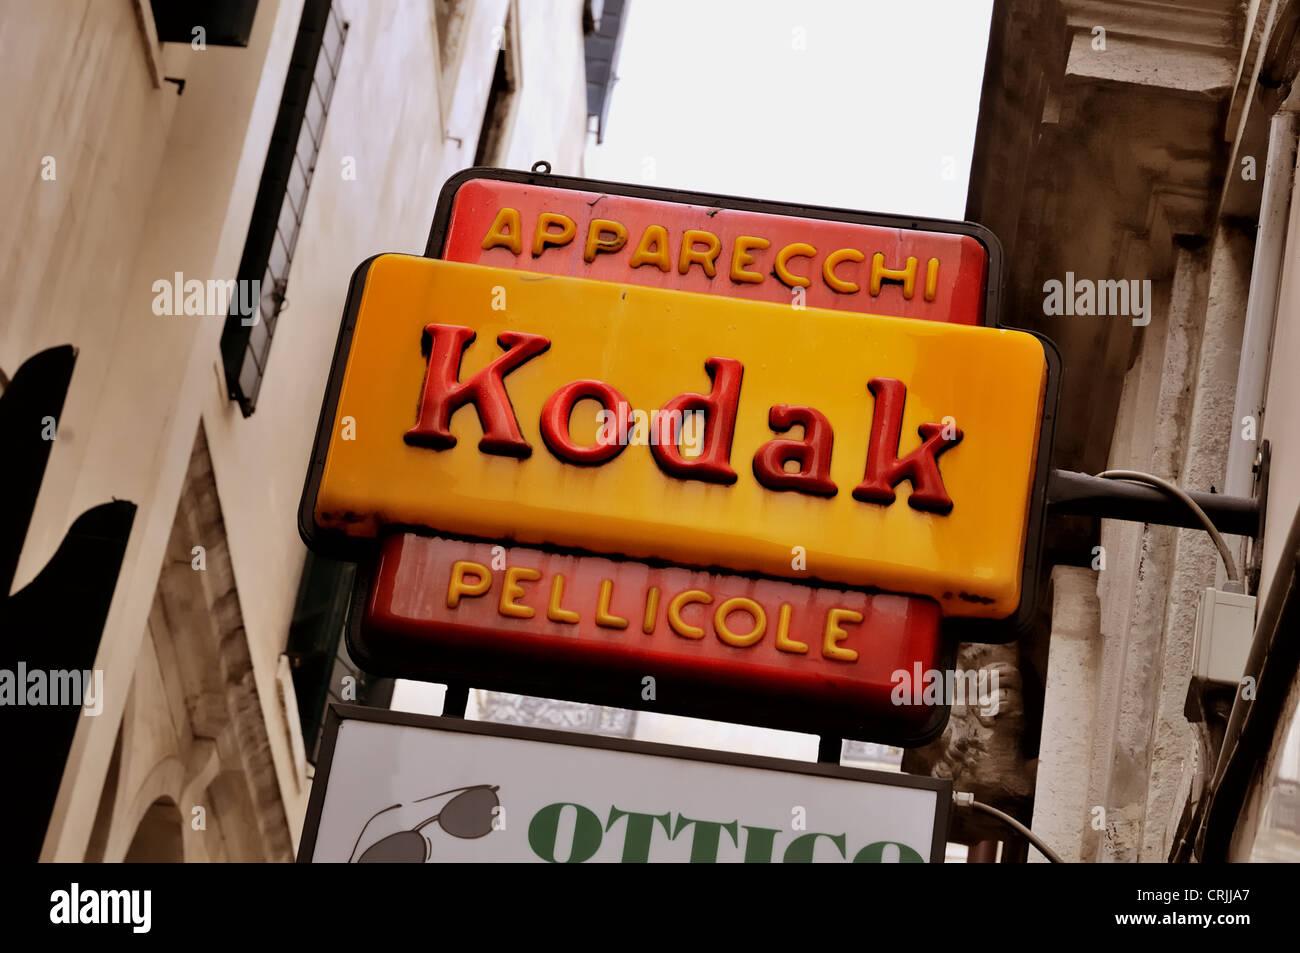 kodak film sign italy venice alamy clipping included path icon